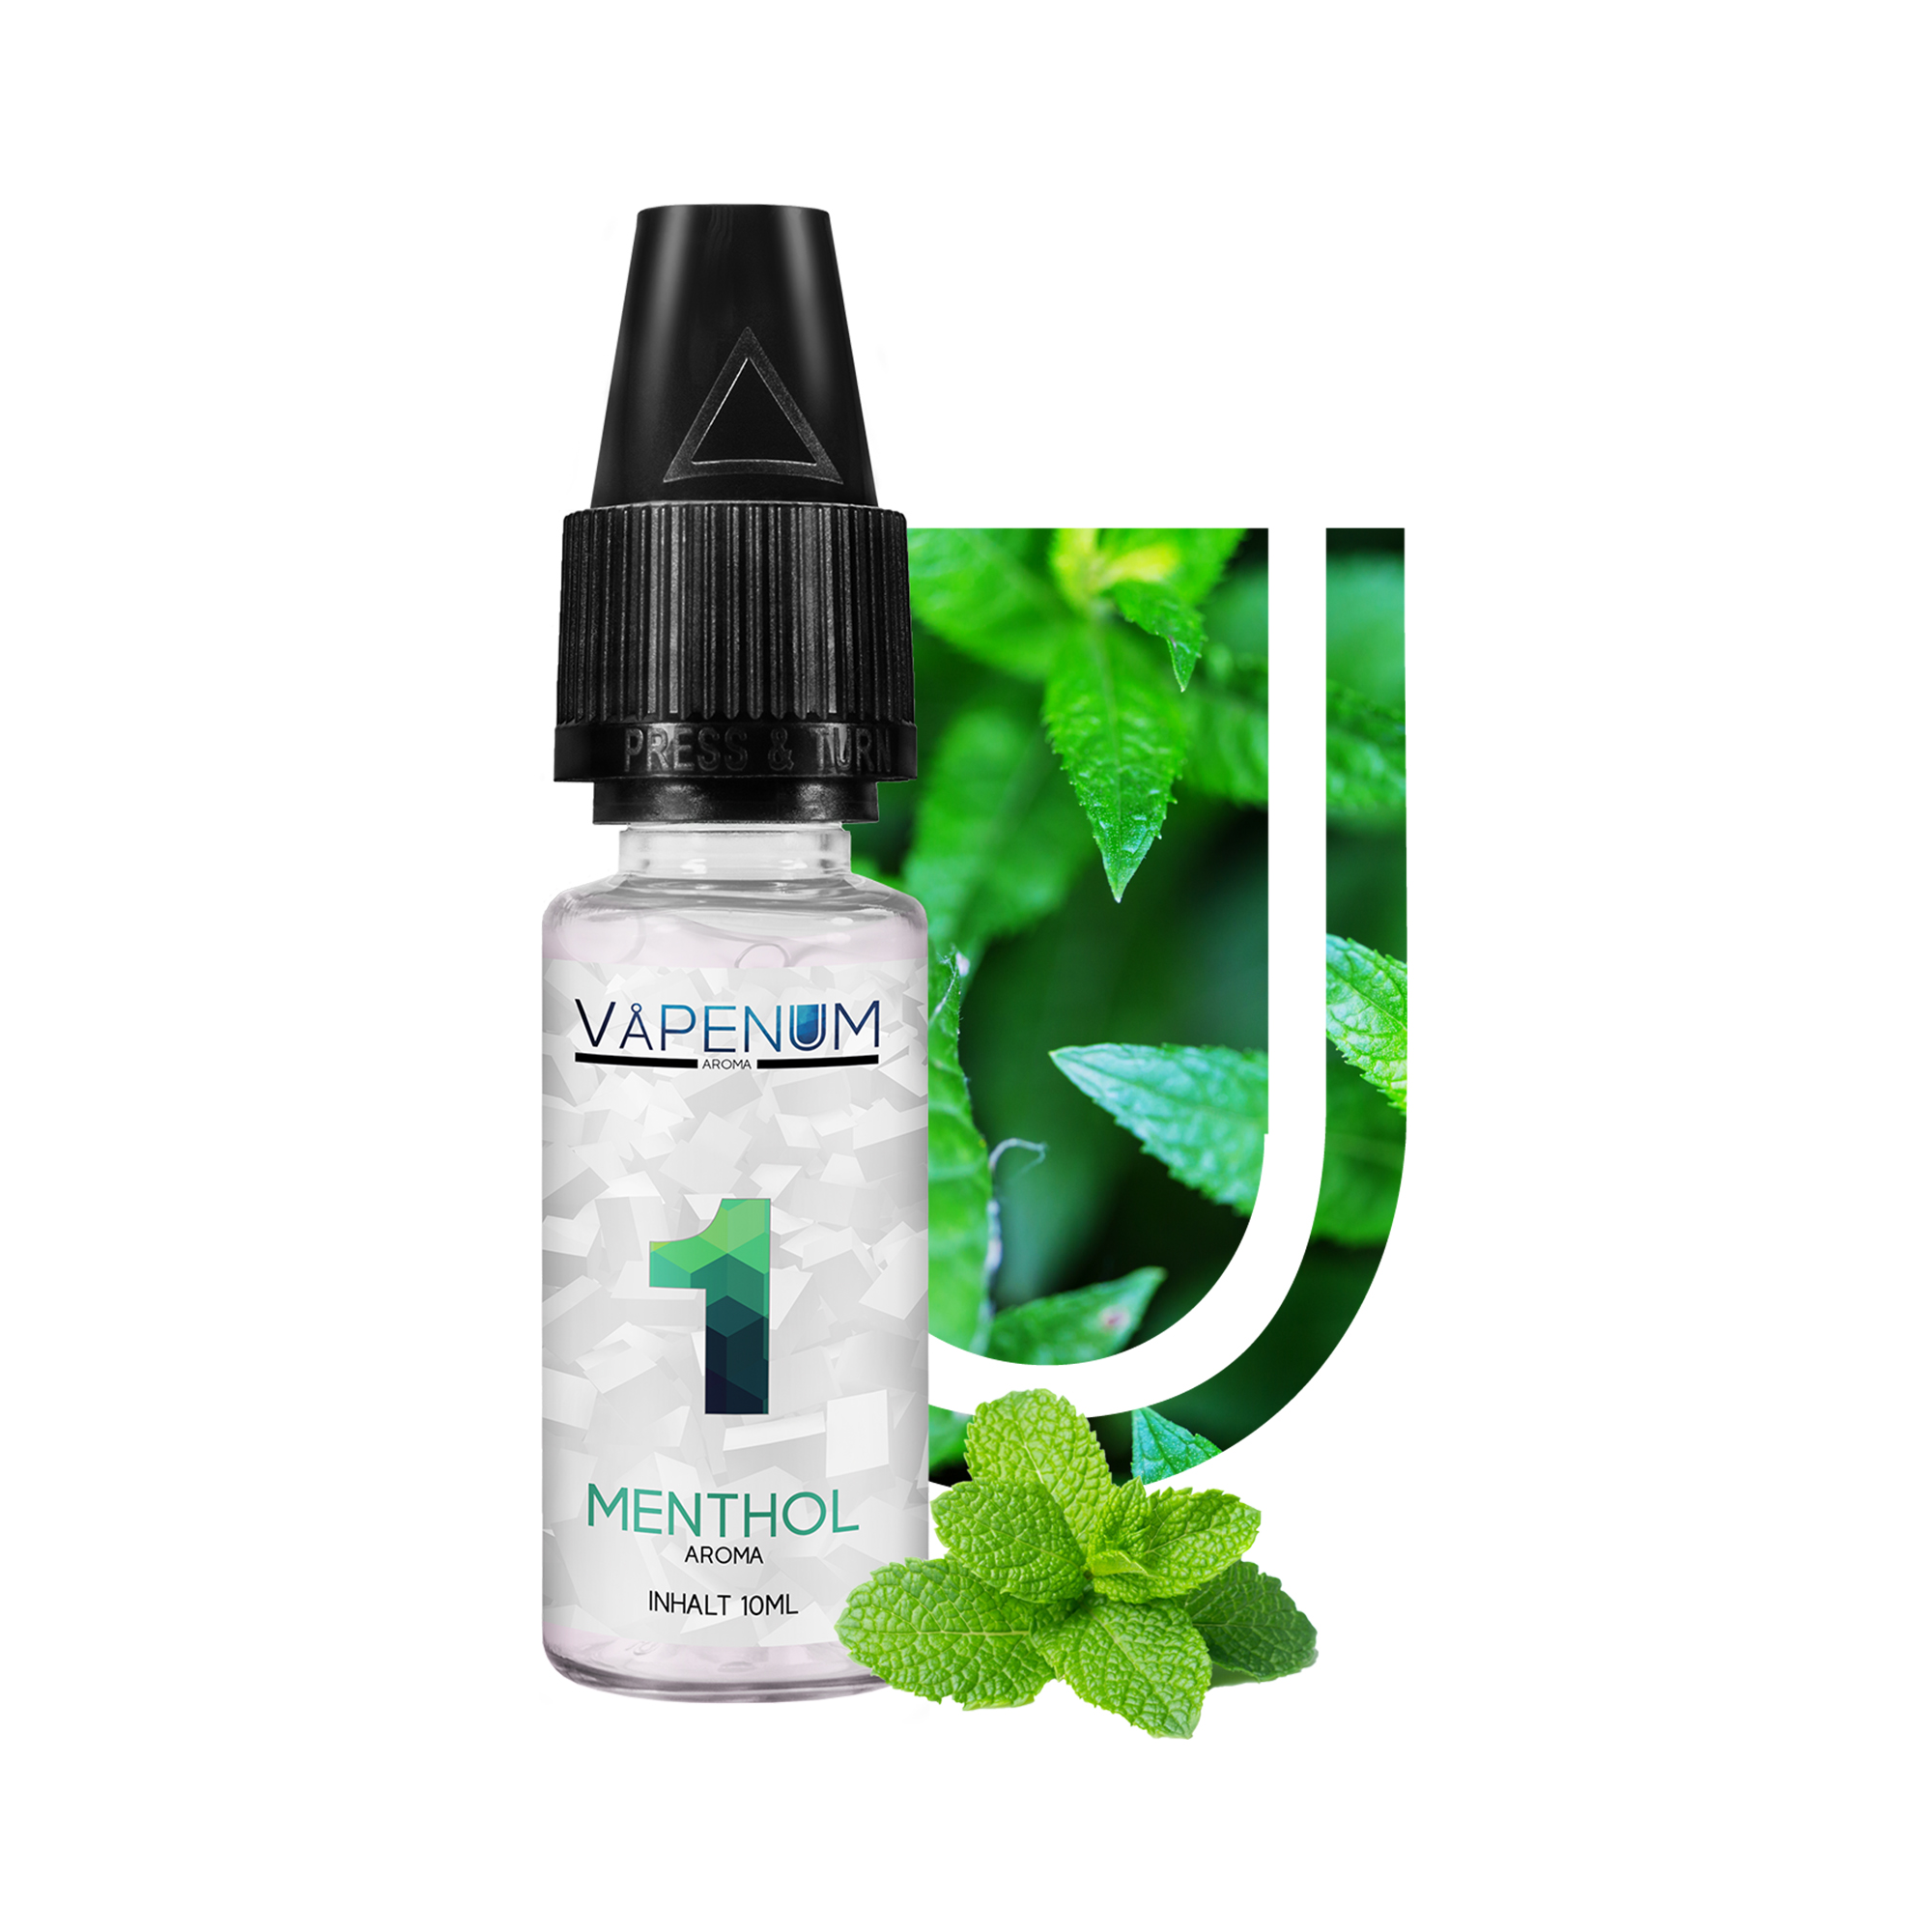 1 - Menthol Aroma by Vapenum